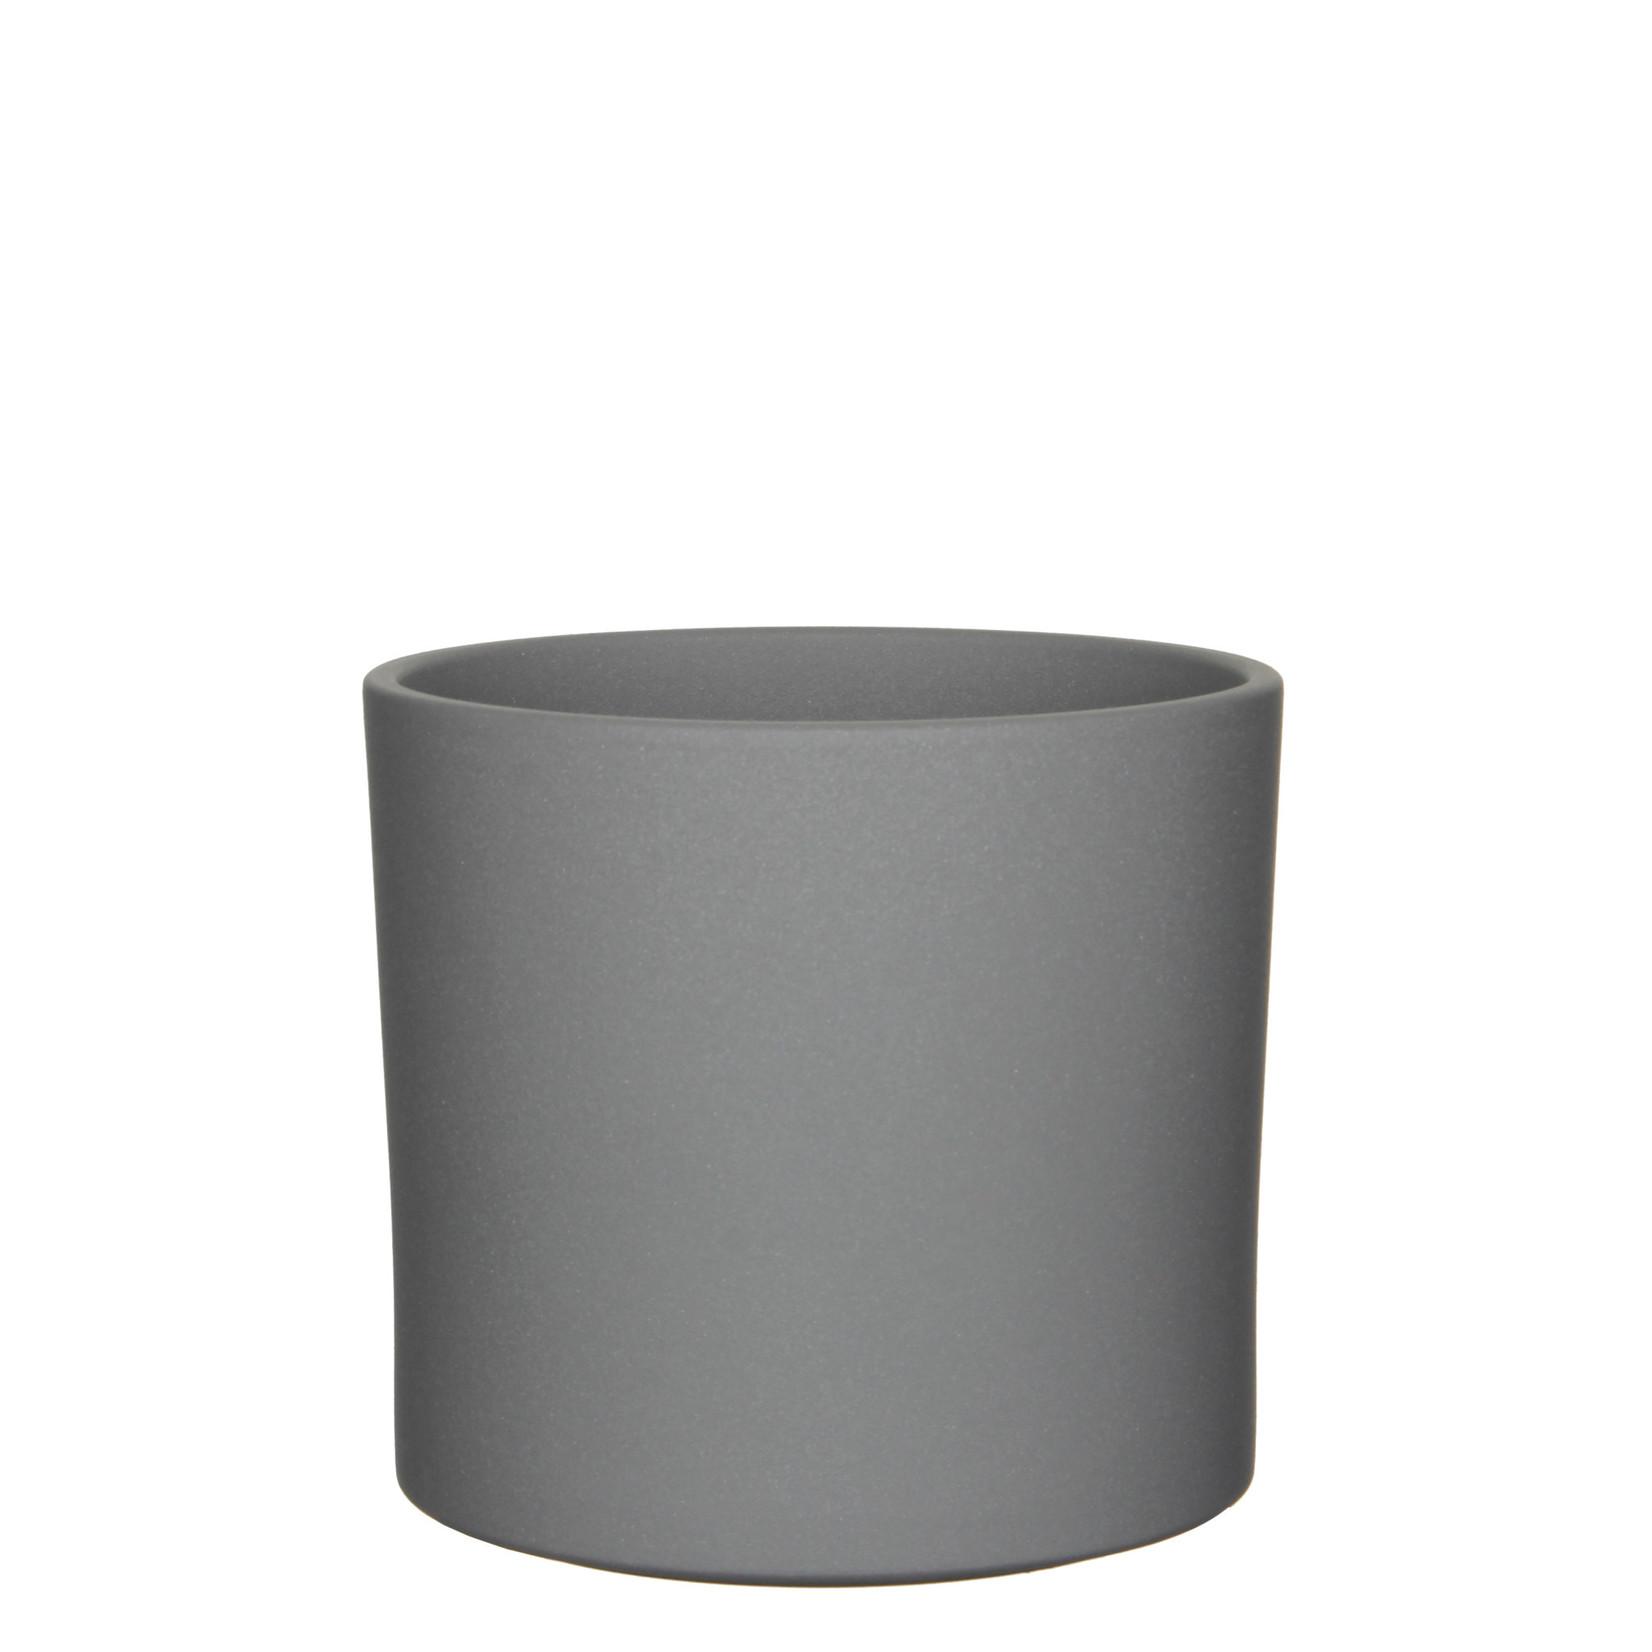 Era pot round grey sand - h21,5xd23cm